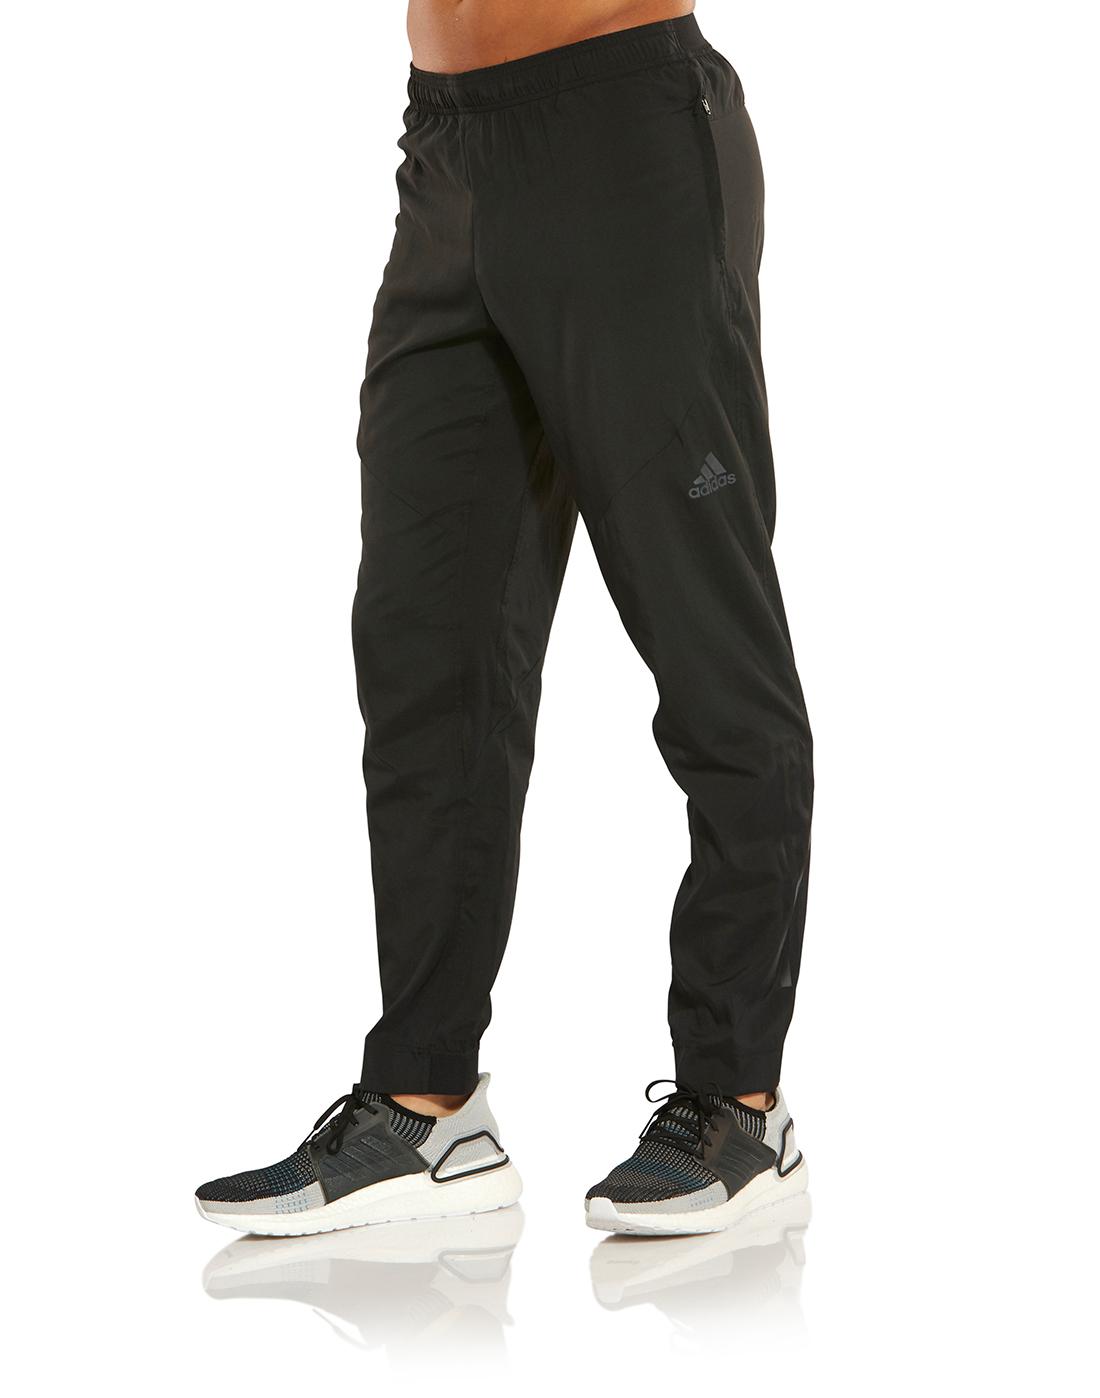 d98d3e9a3 adidas Mens Workout Pants | Life Style Sports